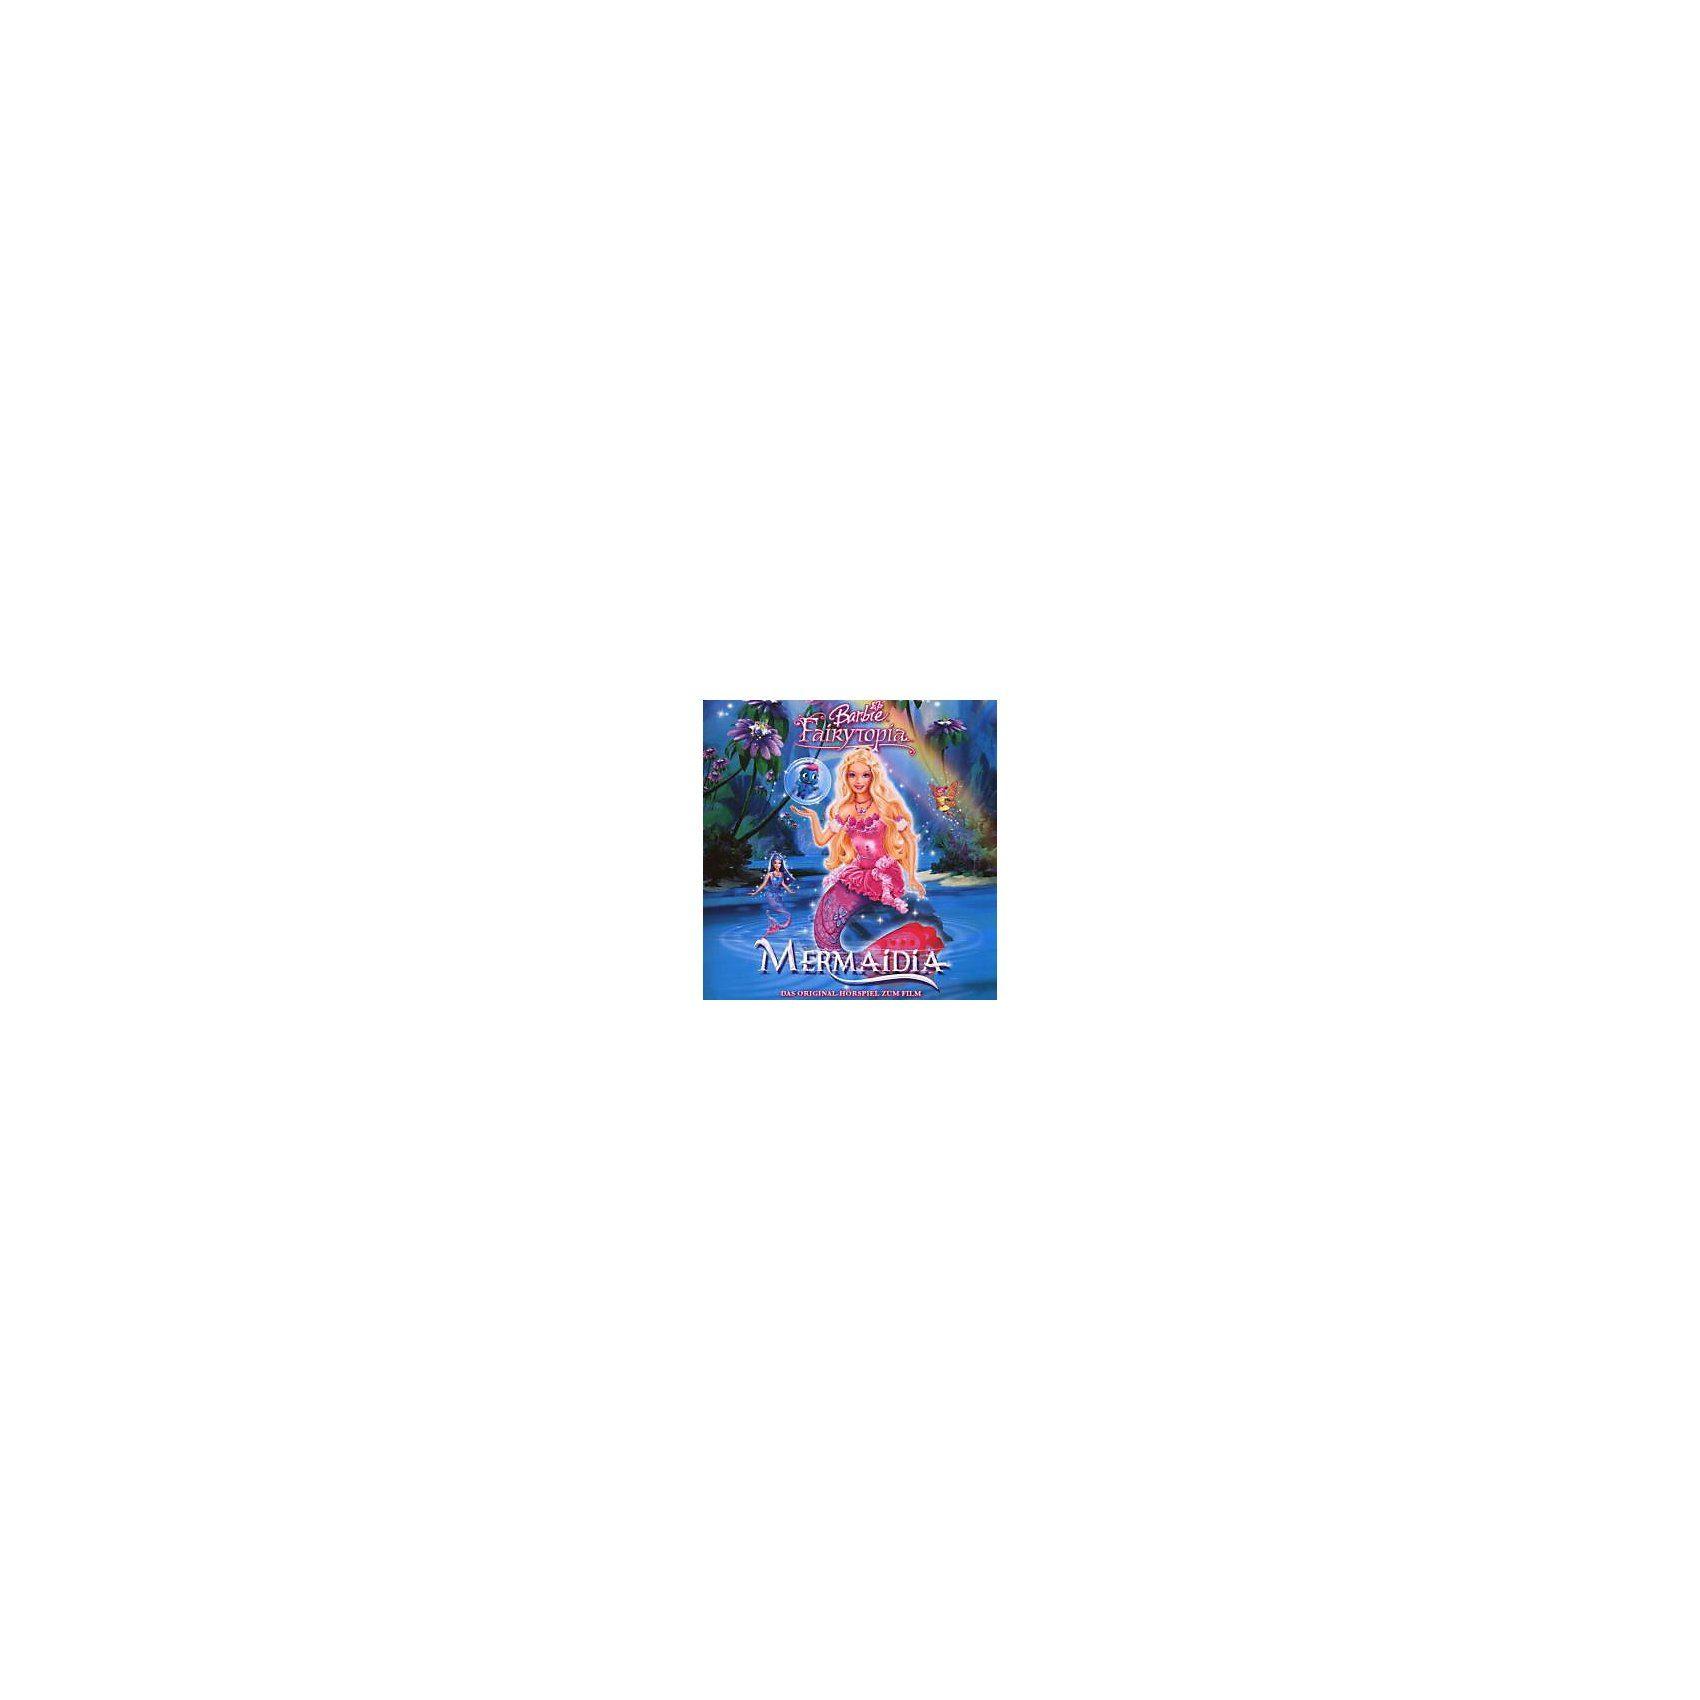 Edel Germany GmbH CD Barbie: Mermaidia